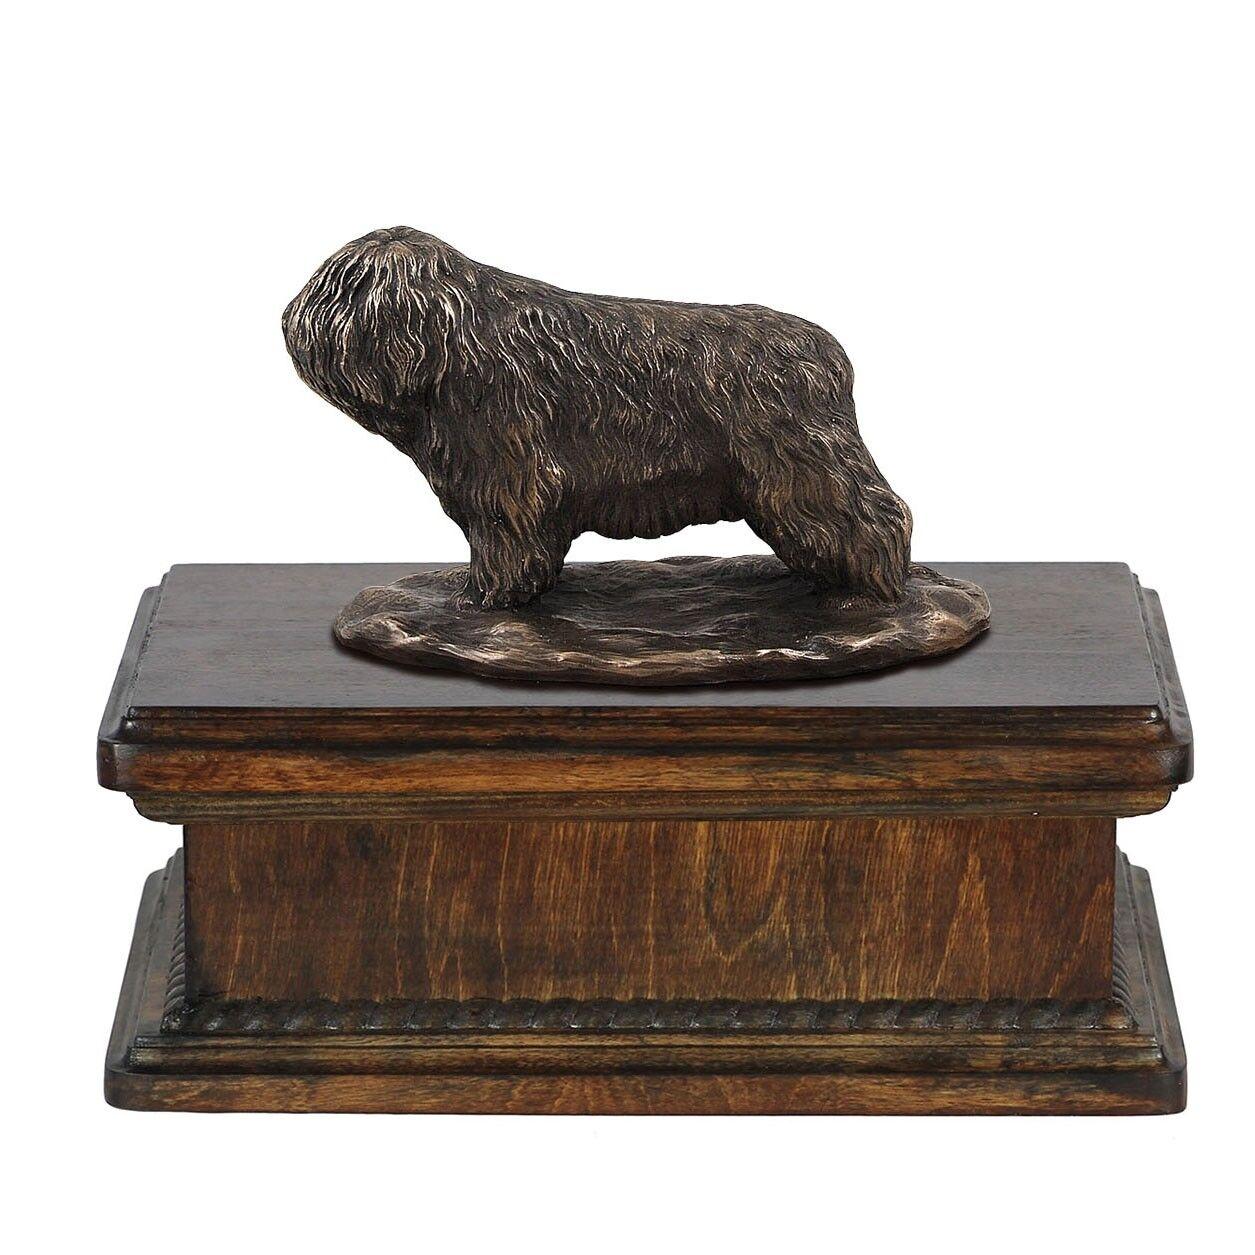 Polish Lowland Sheepdog  exclusive urn with dog statue, High Quality, Art Dog